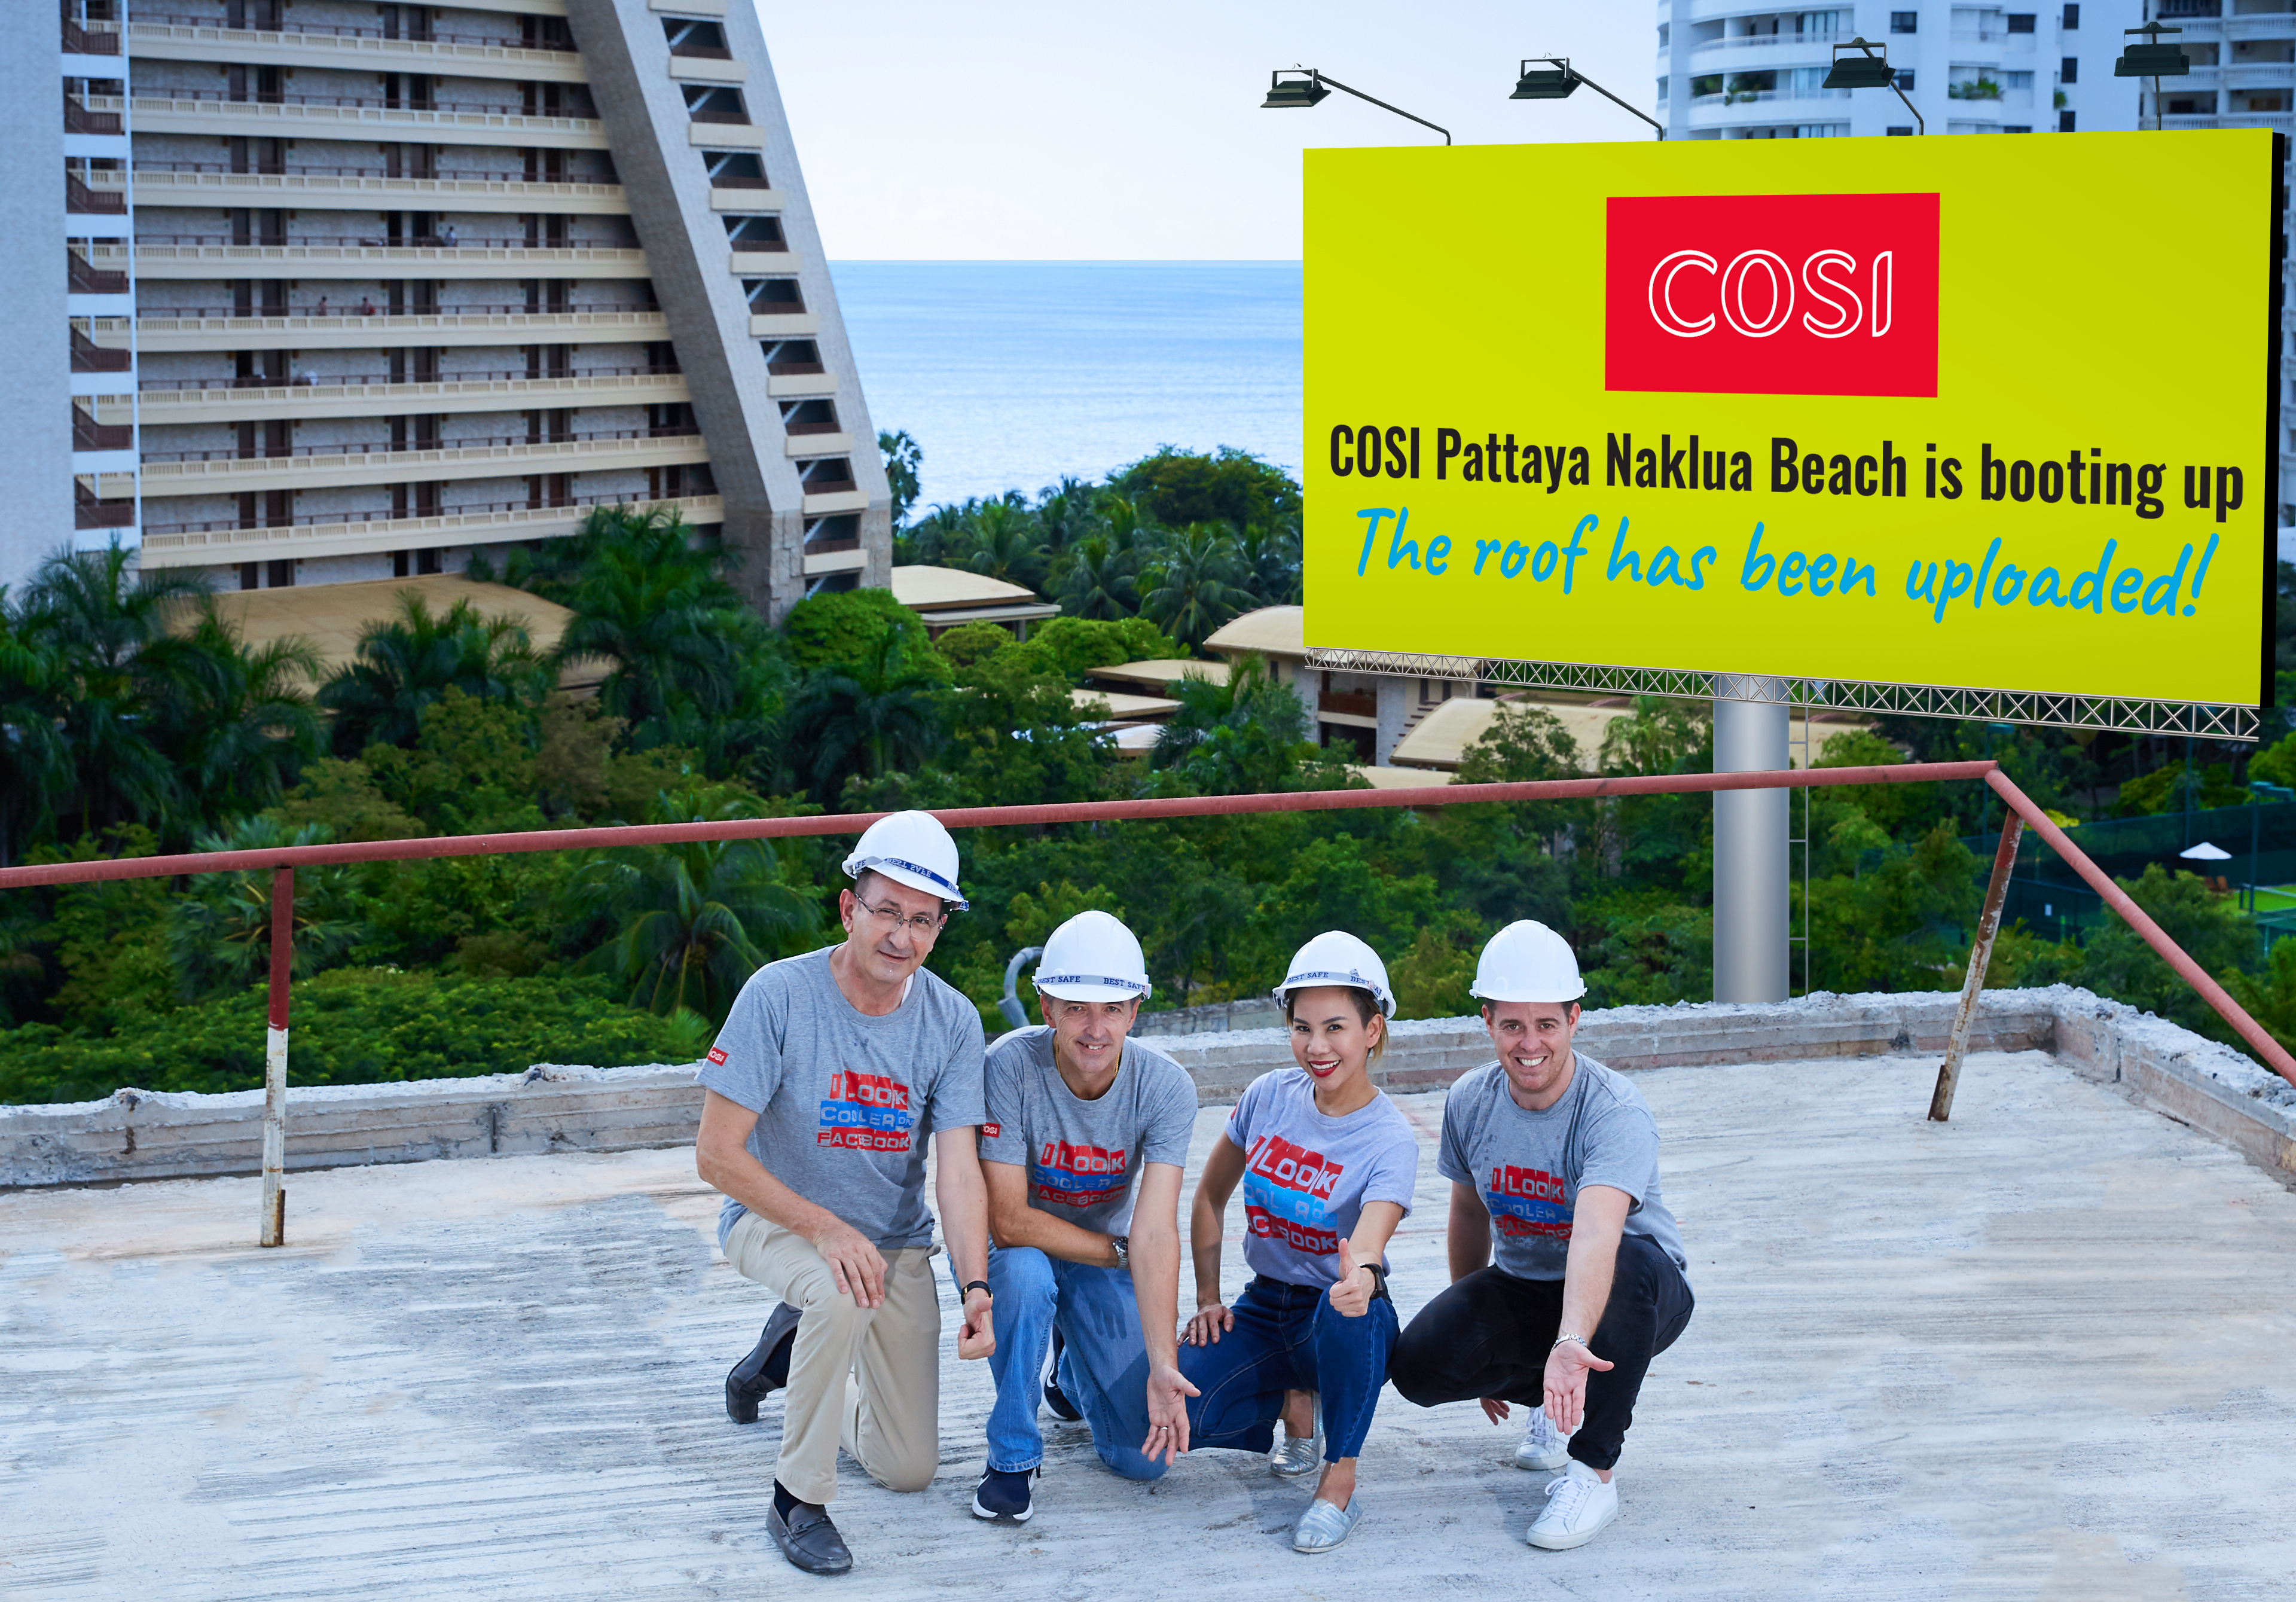 COSI Pattaya Naklua Beach raises the roof